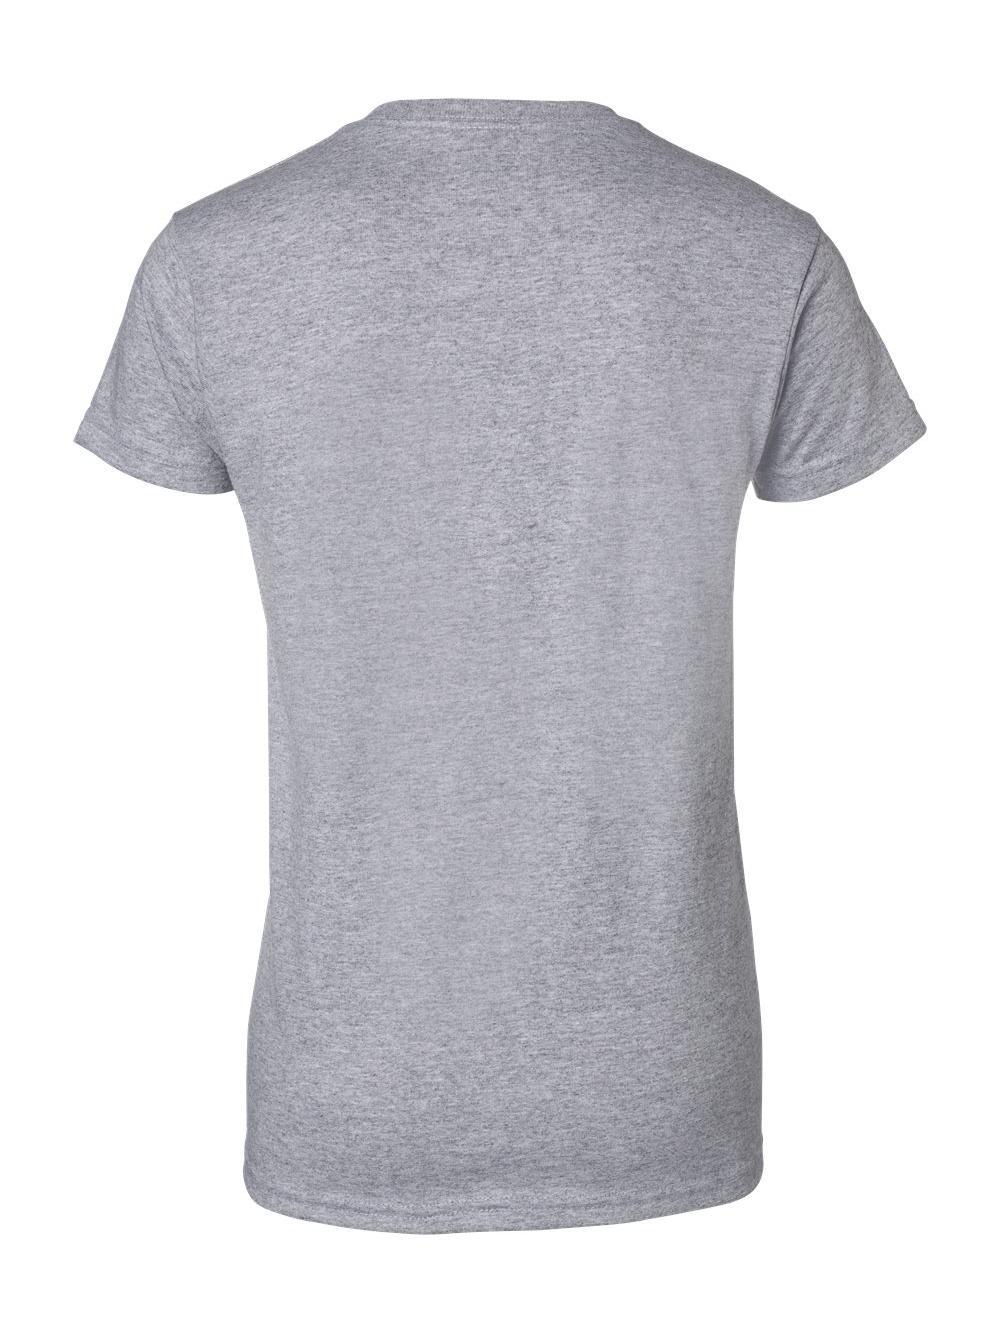 Gildan-Ultra-Cotton-Women-039-s-T-Shirt-2000L thumbnail 67